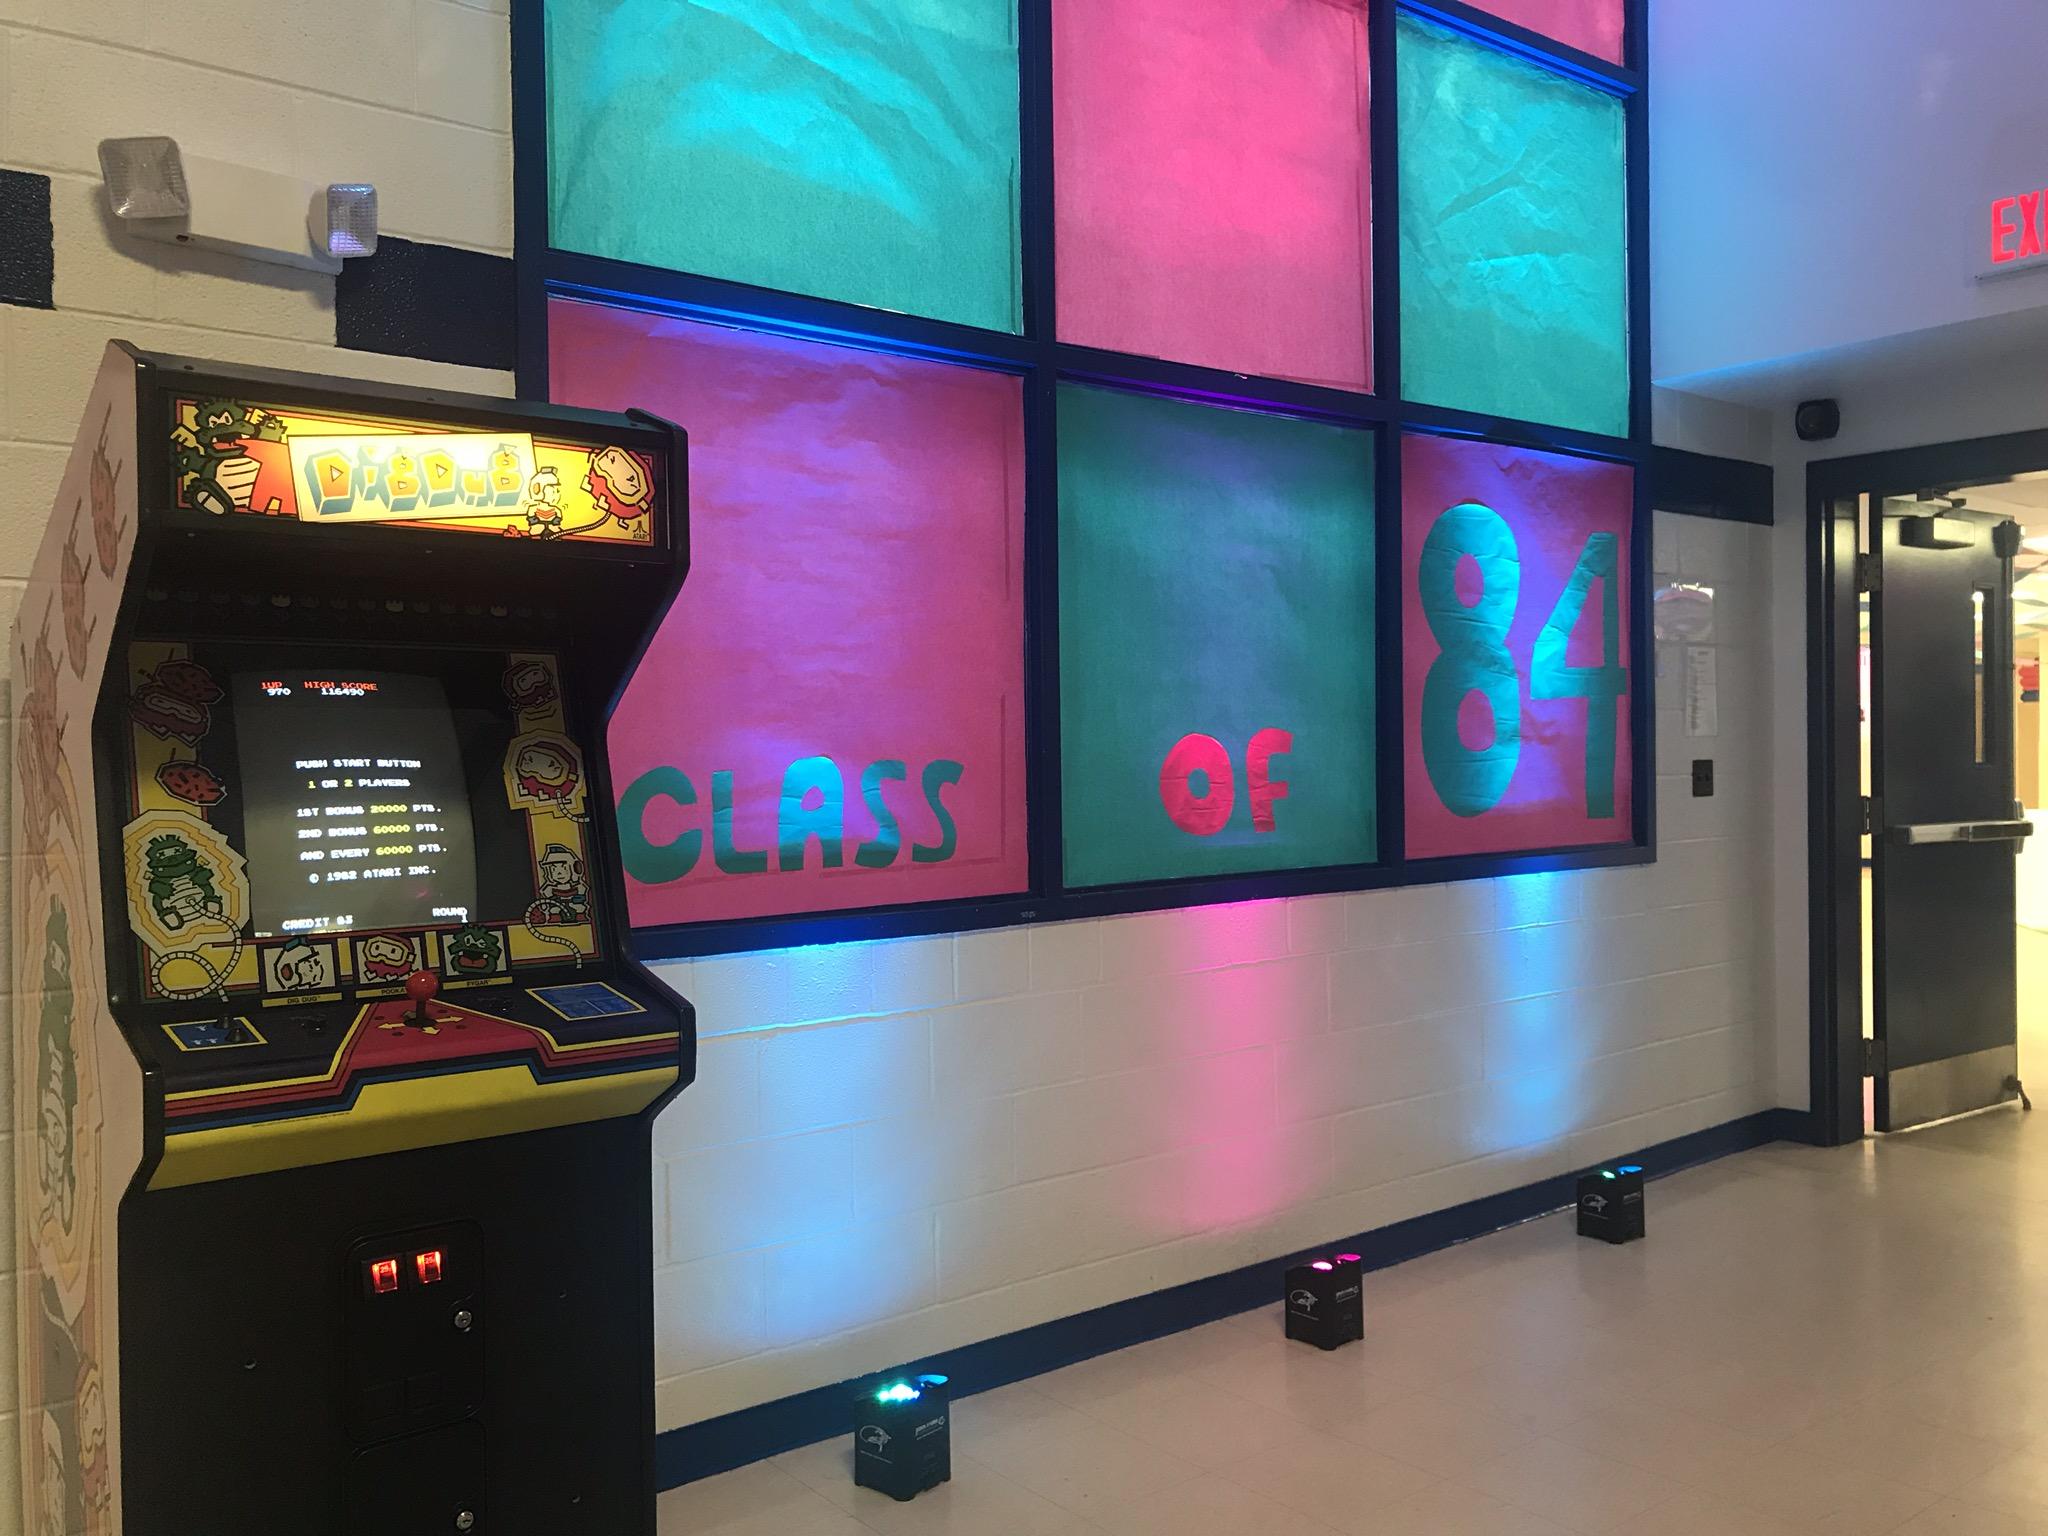 80s Arcade Game